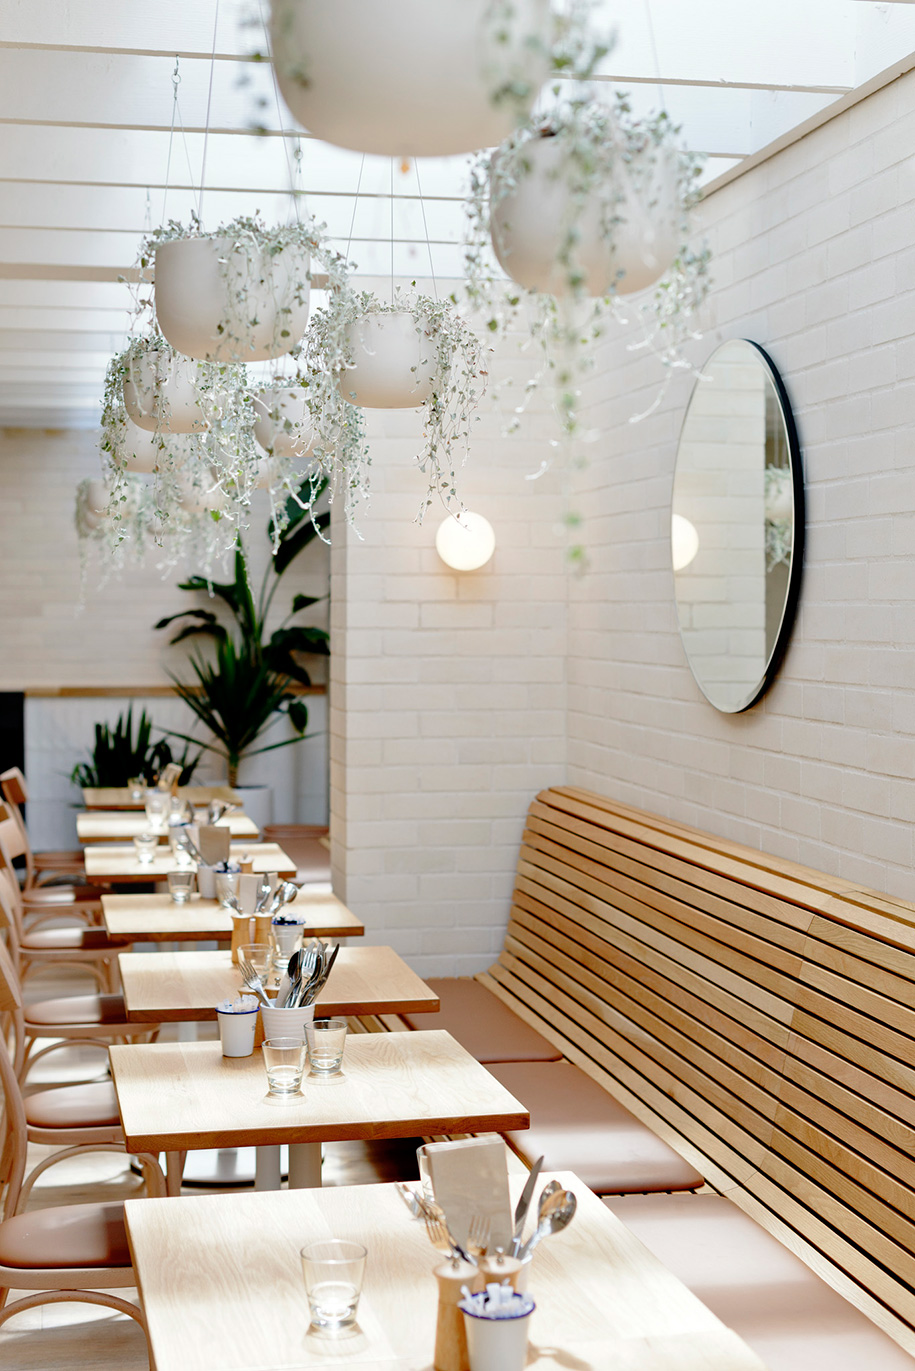 H+E_GerraleSt_Kitchen_237_BLG_RetinaRes